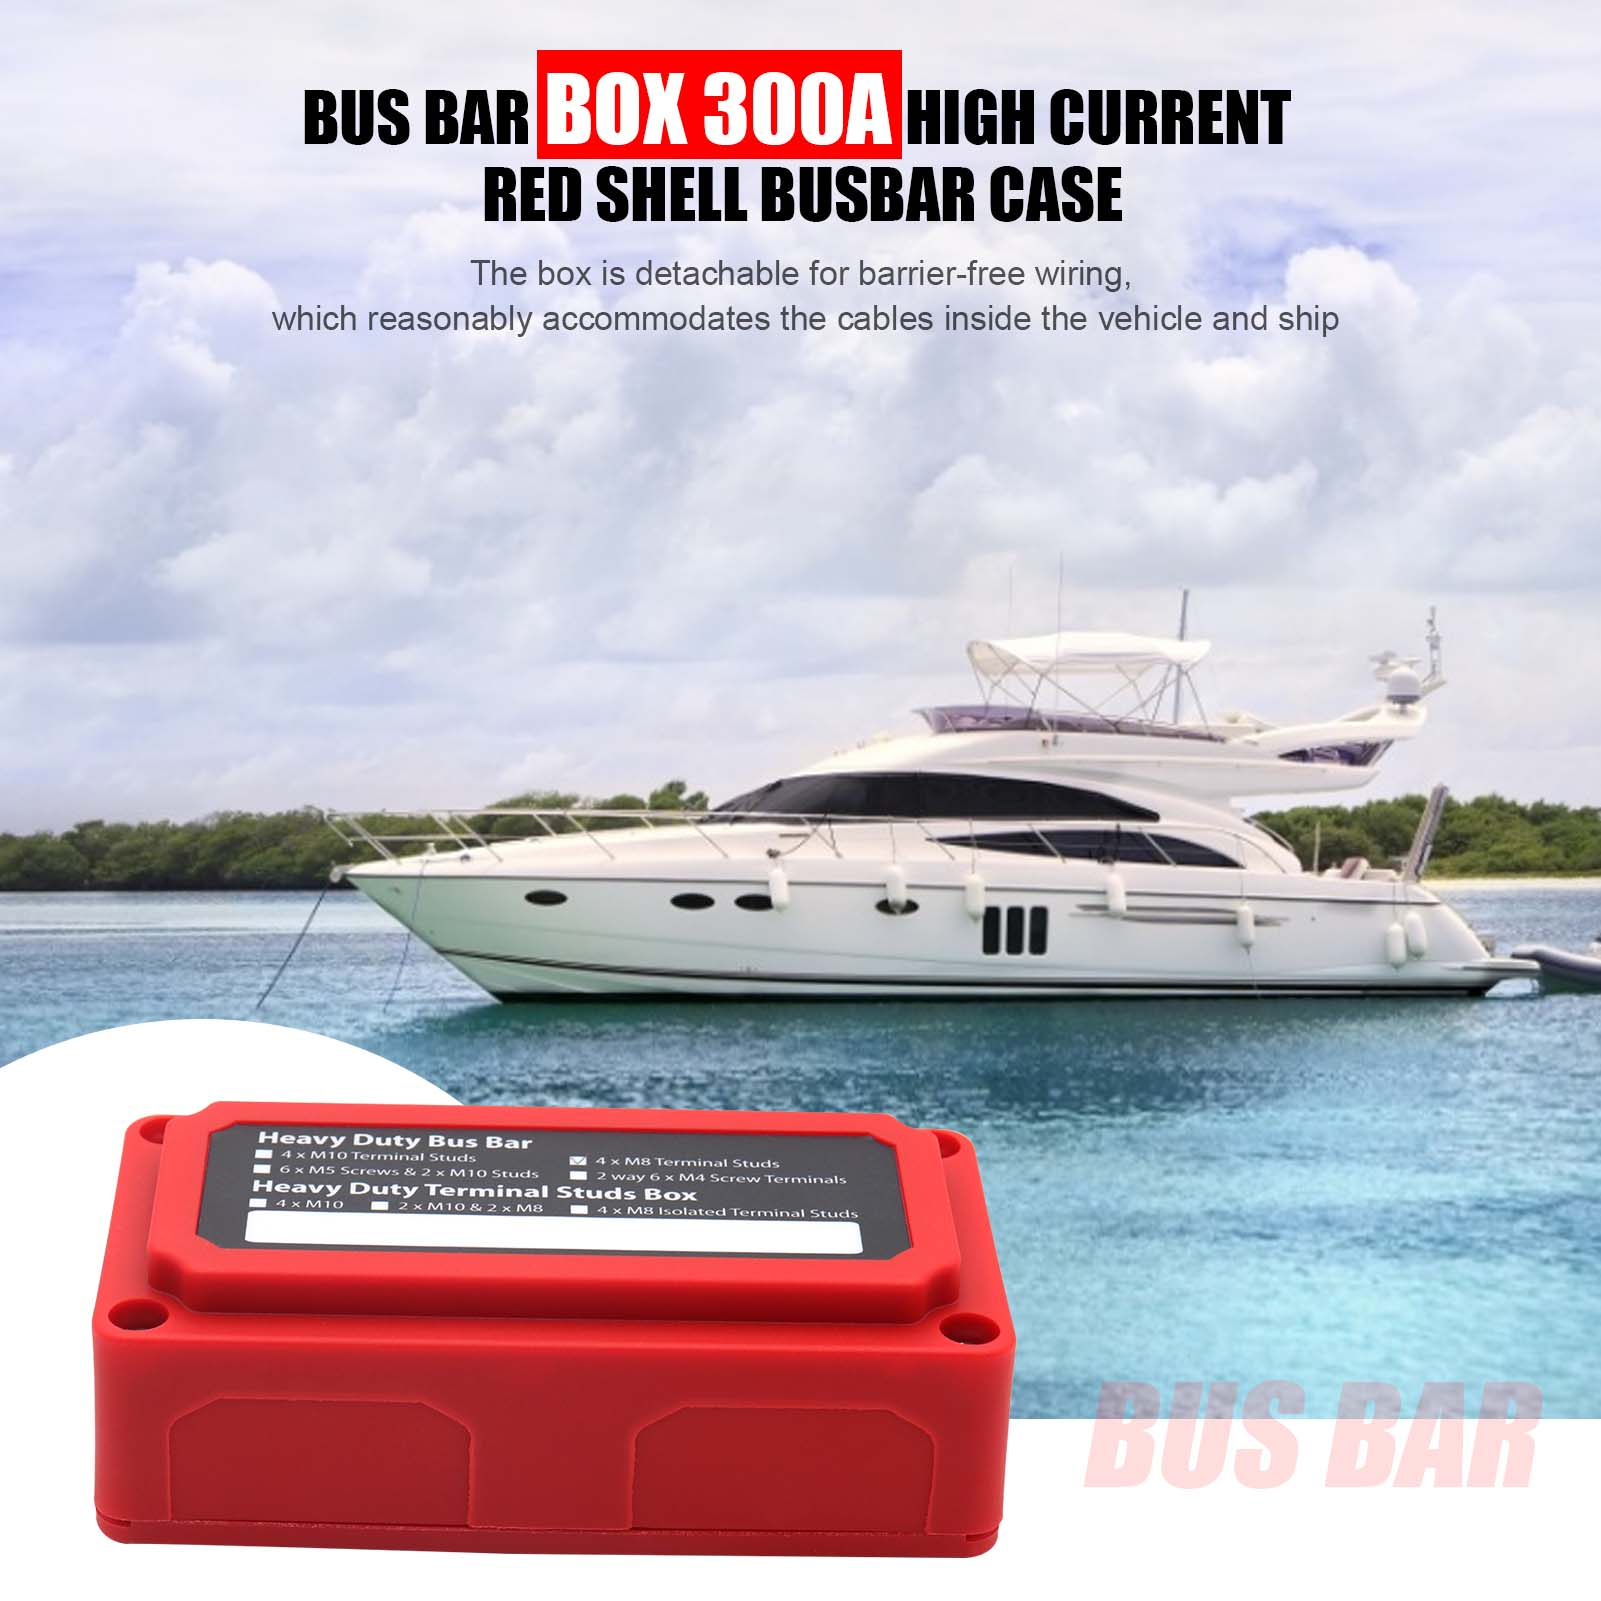 300A 48V New Red Bus Bar Durabe Detachable M8 Box High Current Shell Busbar Case Barrier-free Wiring Supplies Drop Shipping